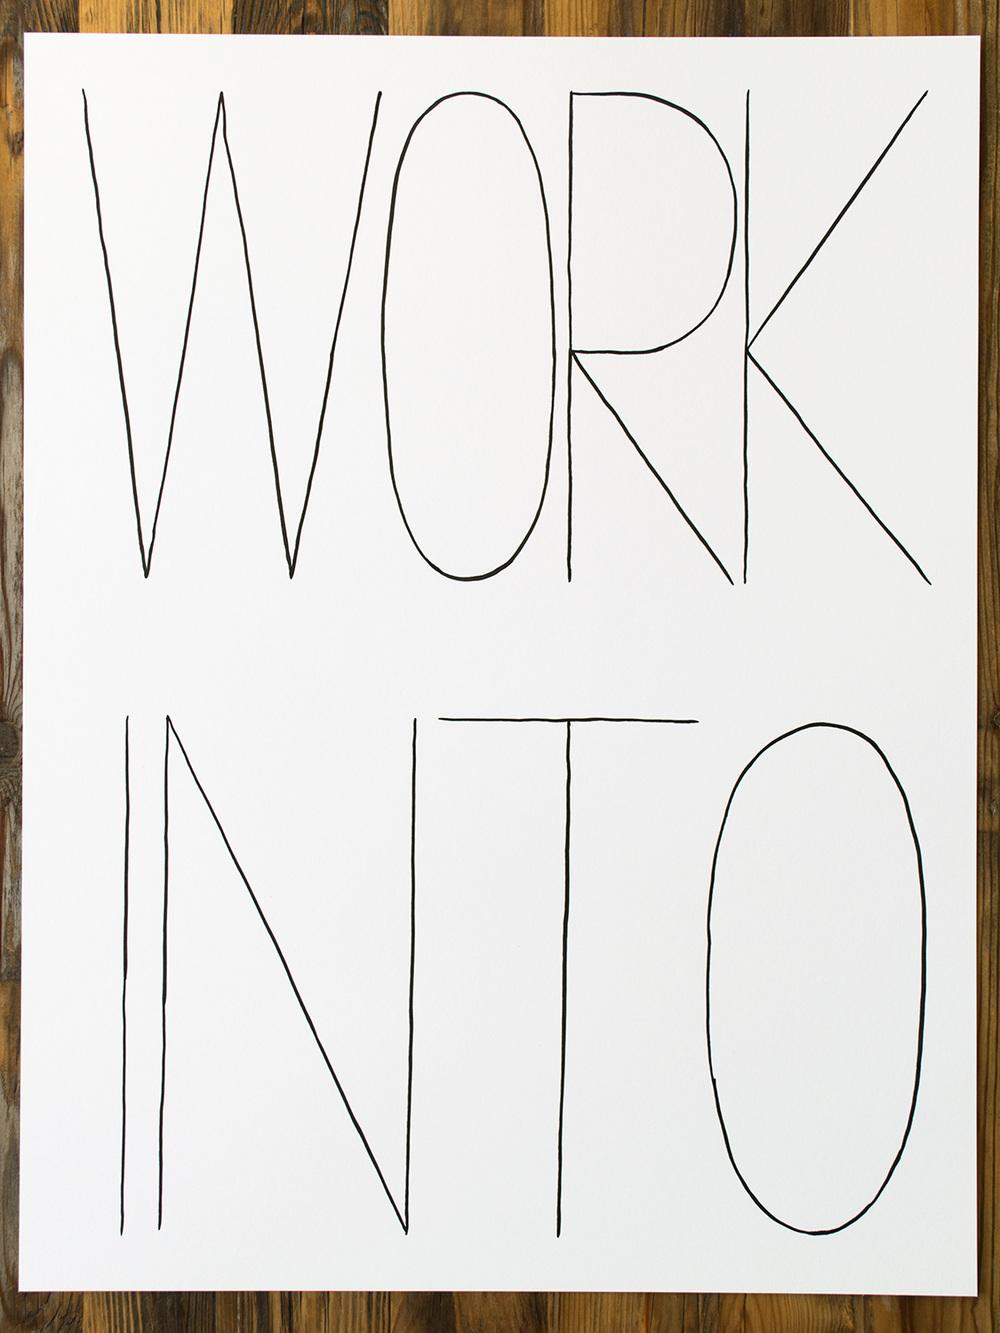 work_into-1500x1125.jpg